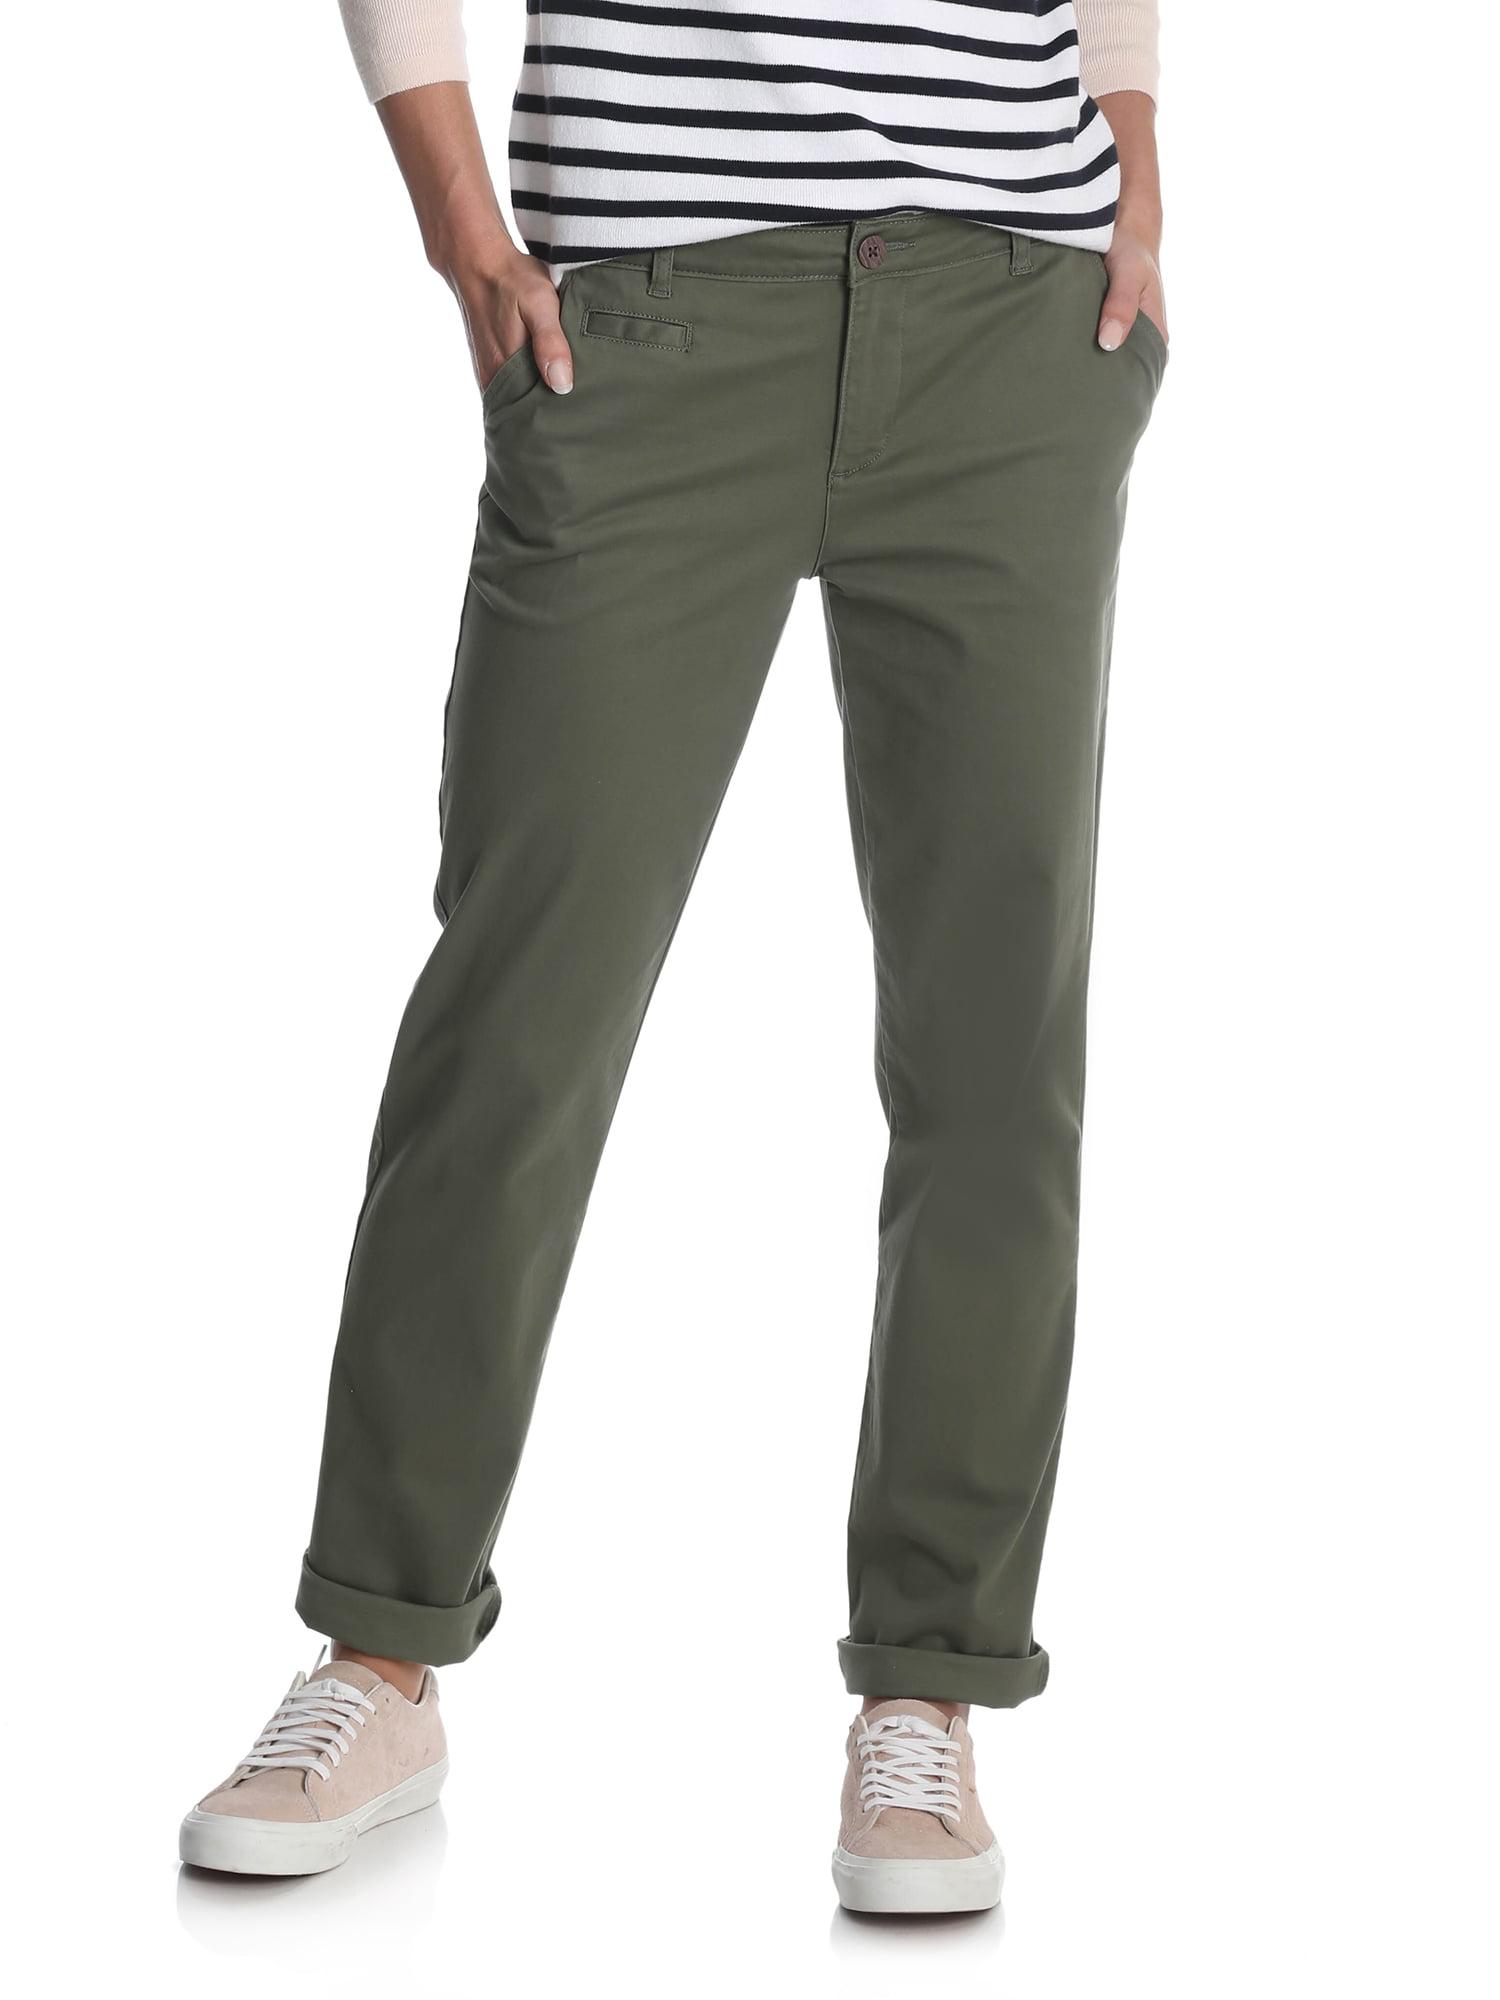 Women's Straight Leg Comfort Waist Pant